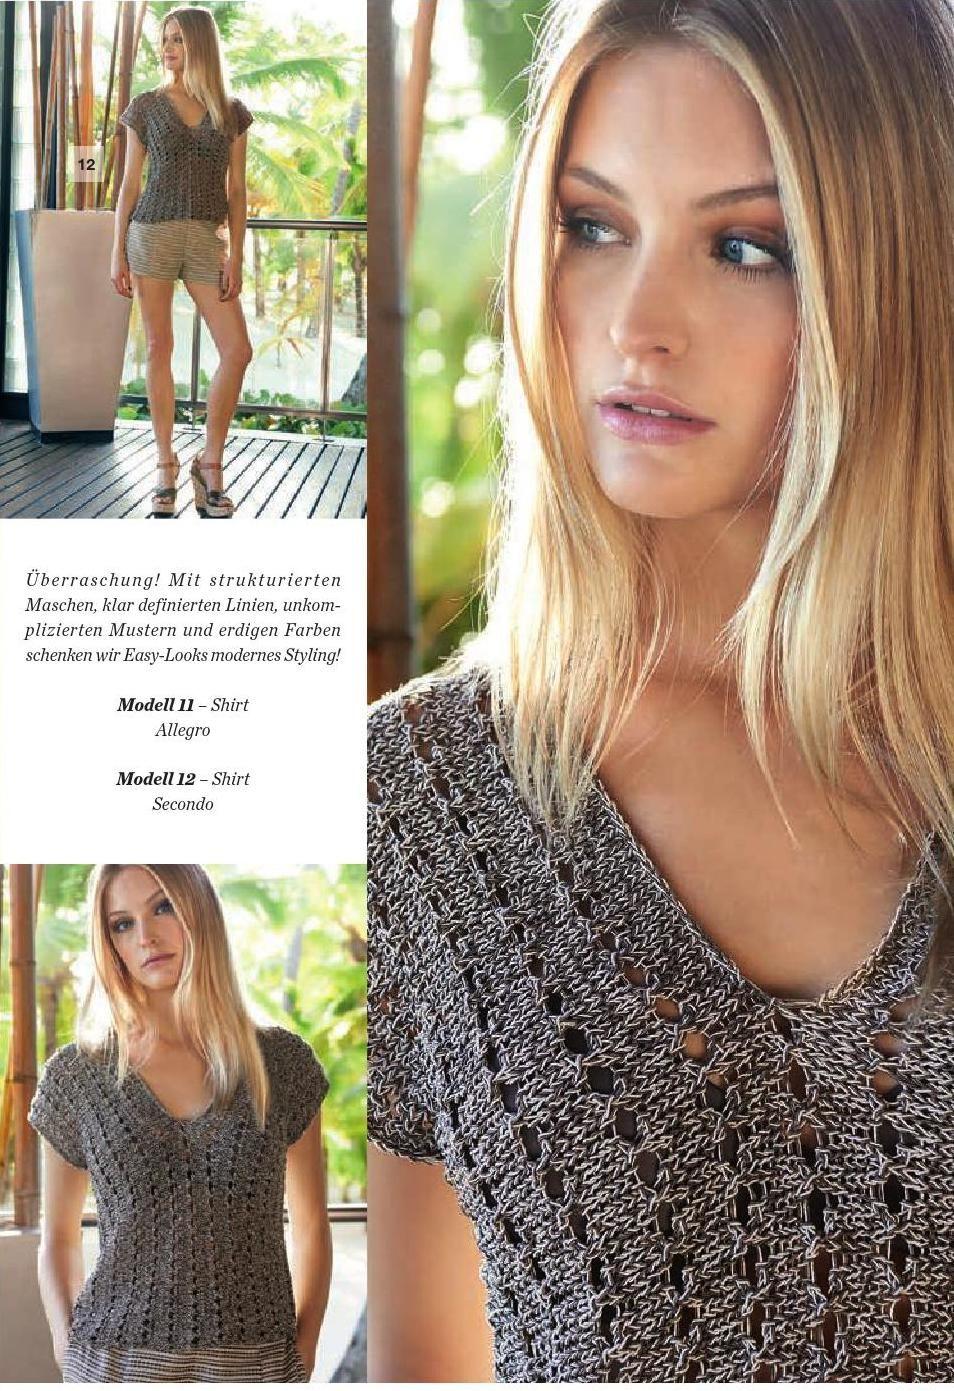 Lana Grossa FILATI Handstrick No. 56   Pinterest   Newspaper and Digital bc6c6dc42f